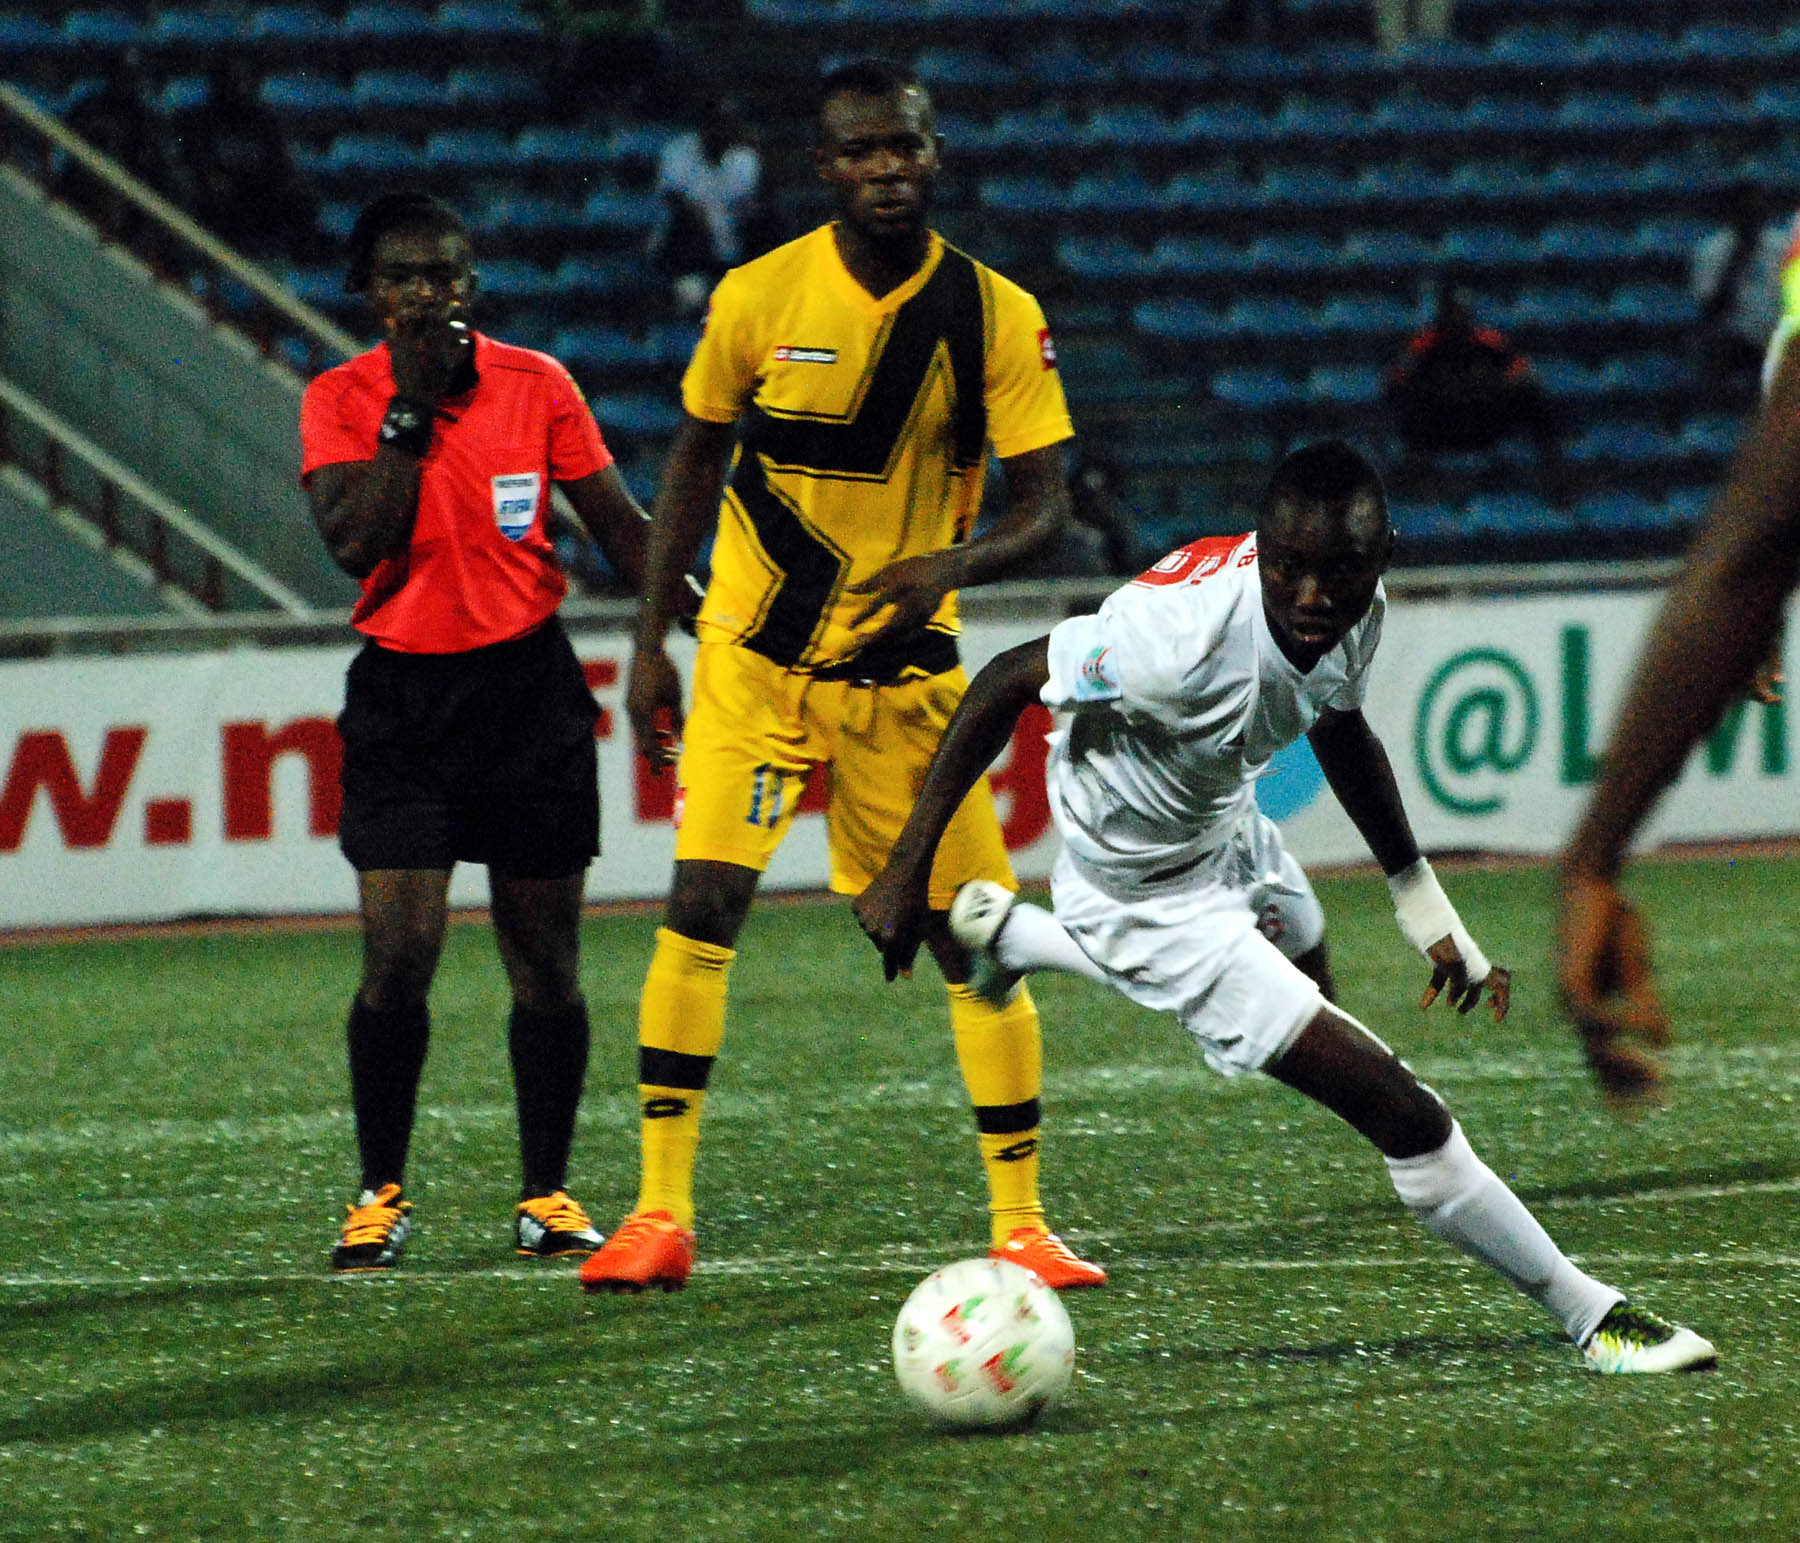 NPFL: Warri Wolves Beat Akwa United, Boost Survival Chances